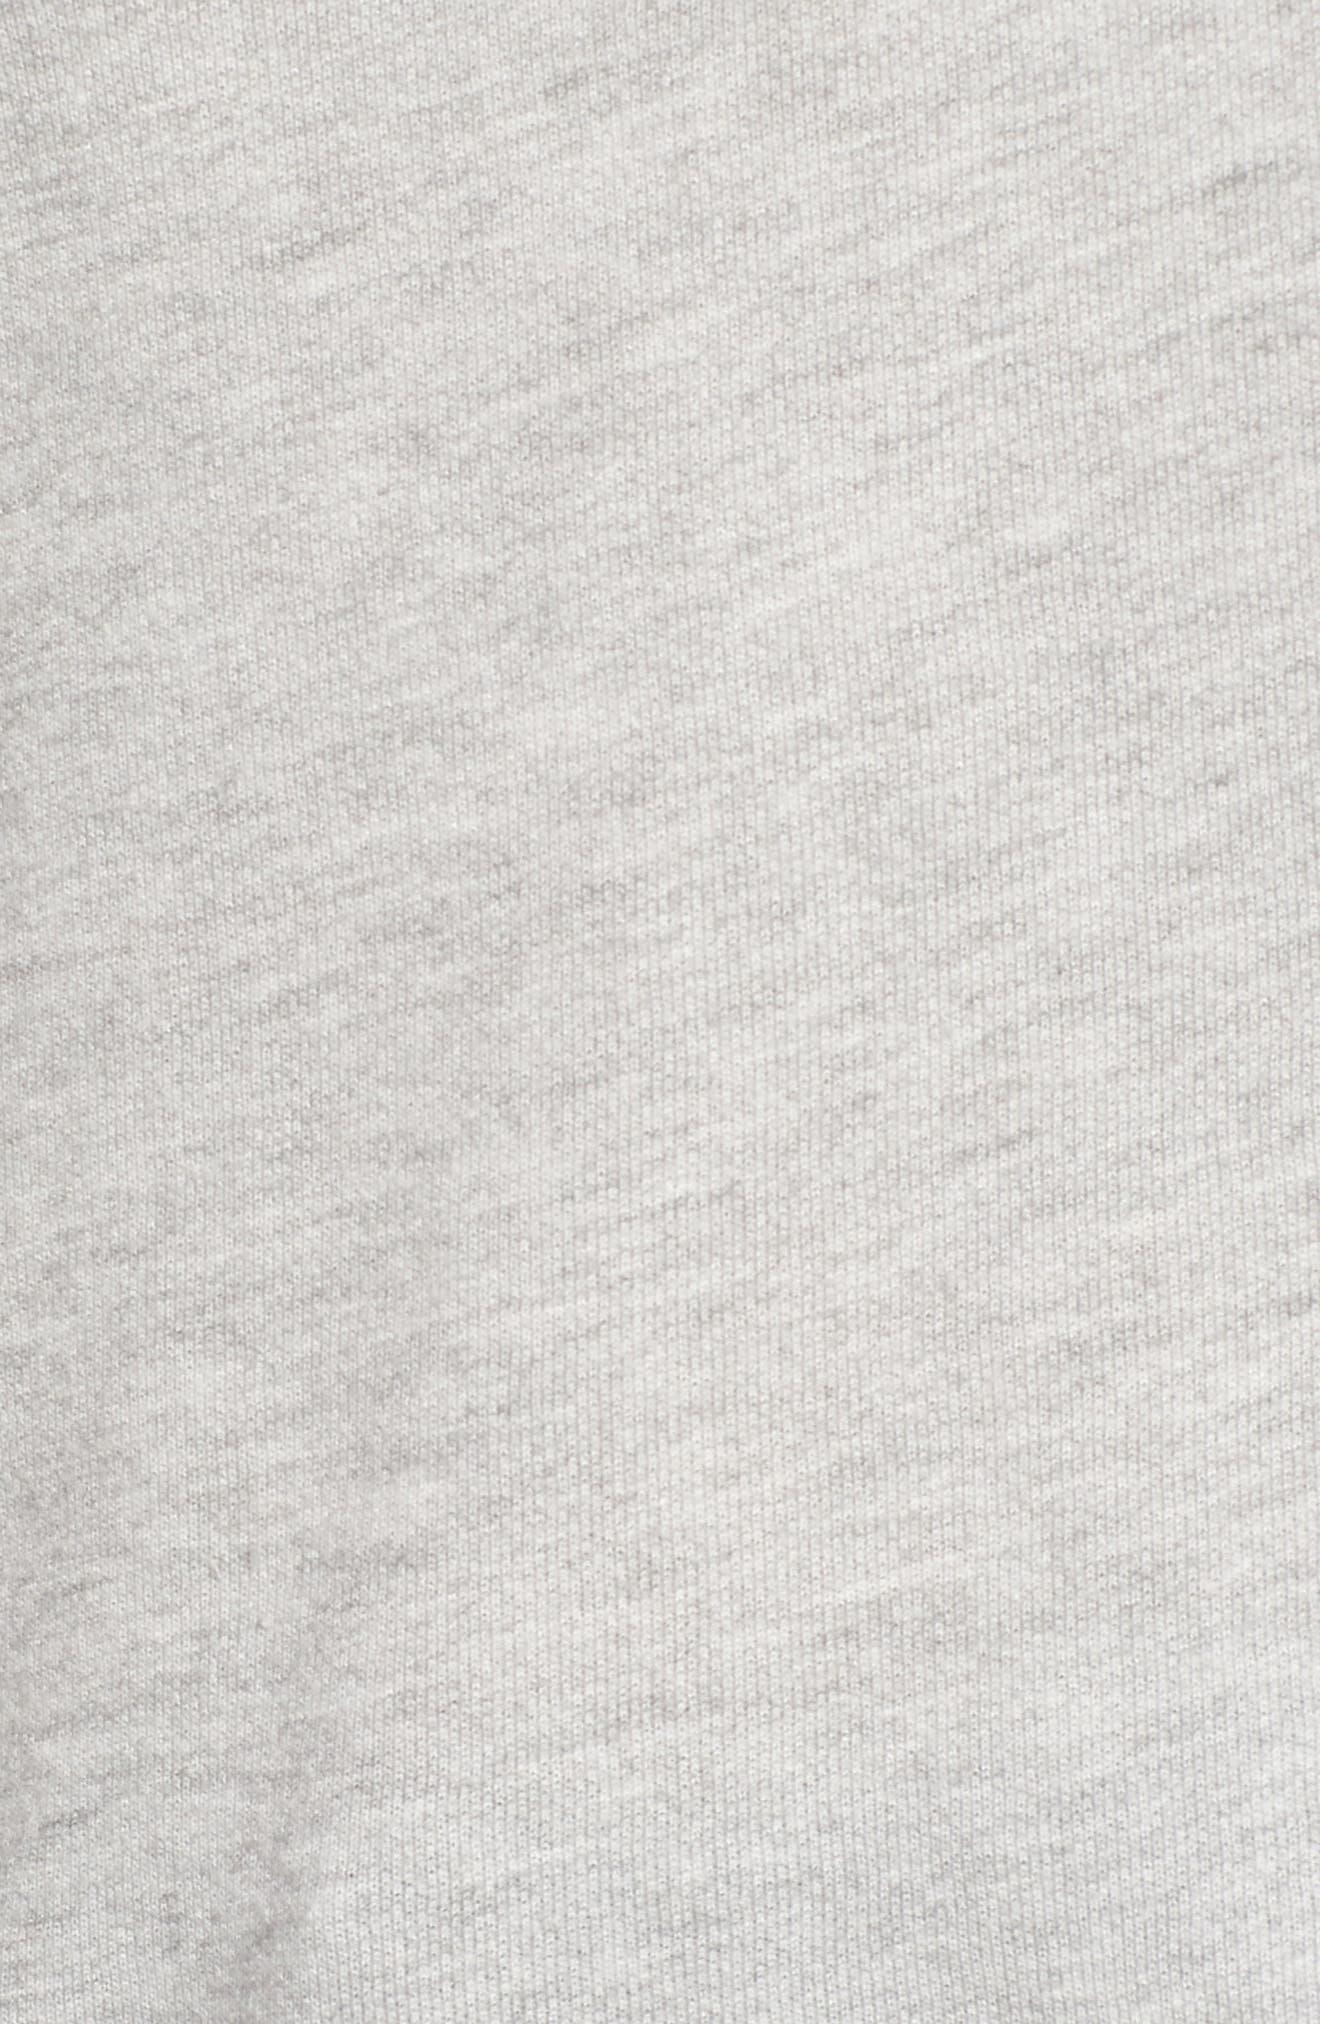 Off the Shoulder Sweatshirt,                             Alternate thumbnail 5, color,                             Grey Heather